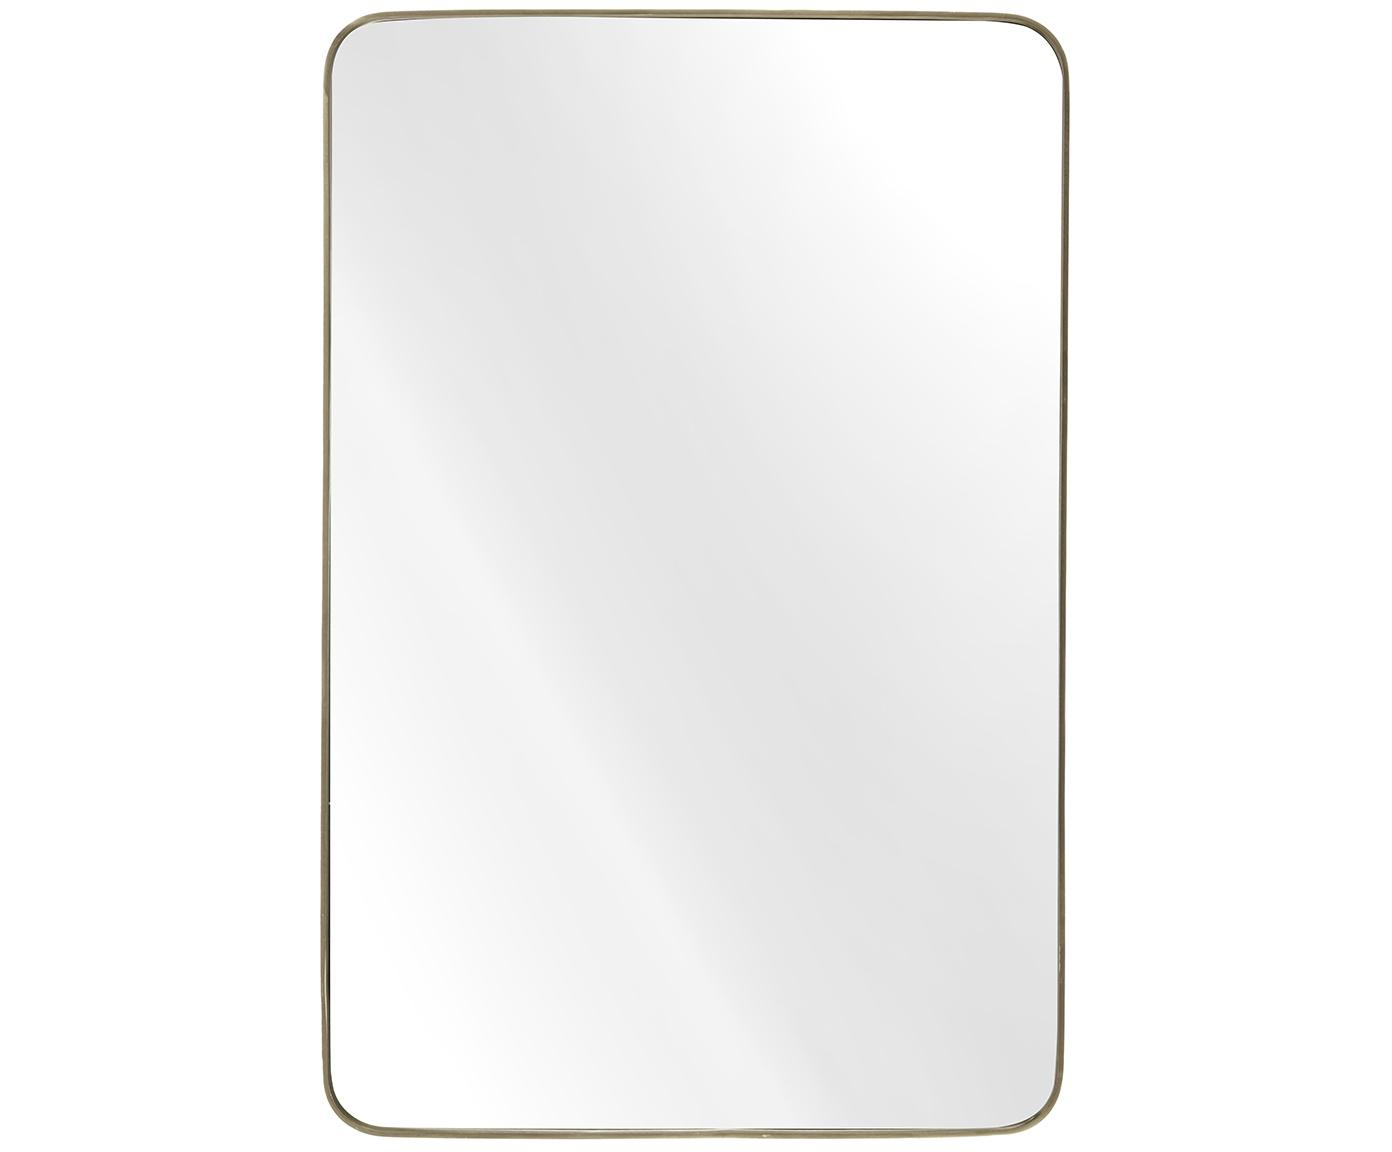 Wandspiegel Adela, Frame: vermessingd metaal, Messingkleurig, 60 x 91 cm